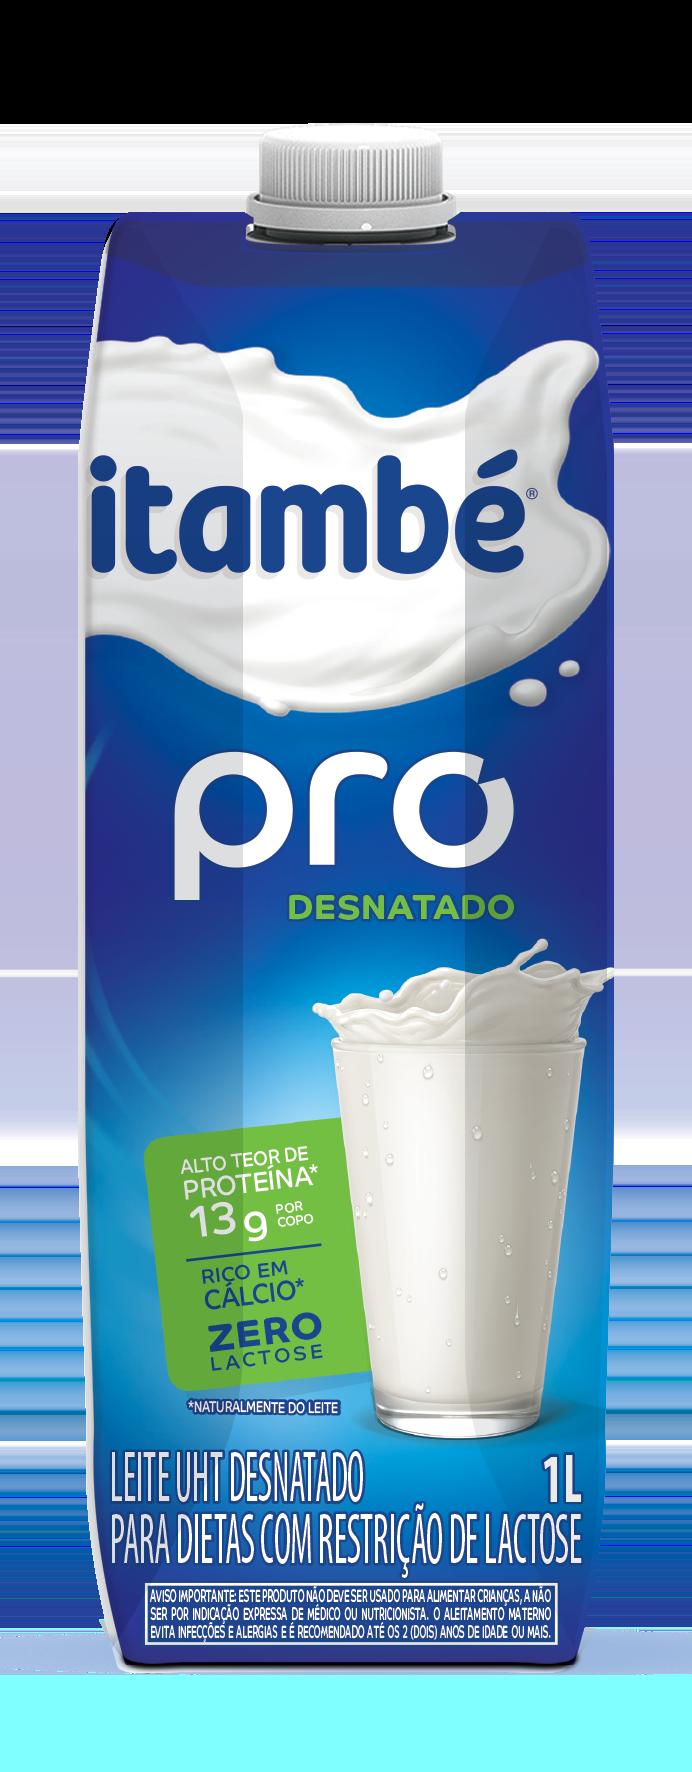 ITAMBE_PRO-DESNATADO